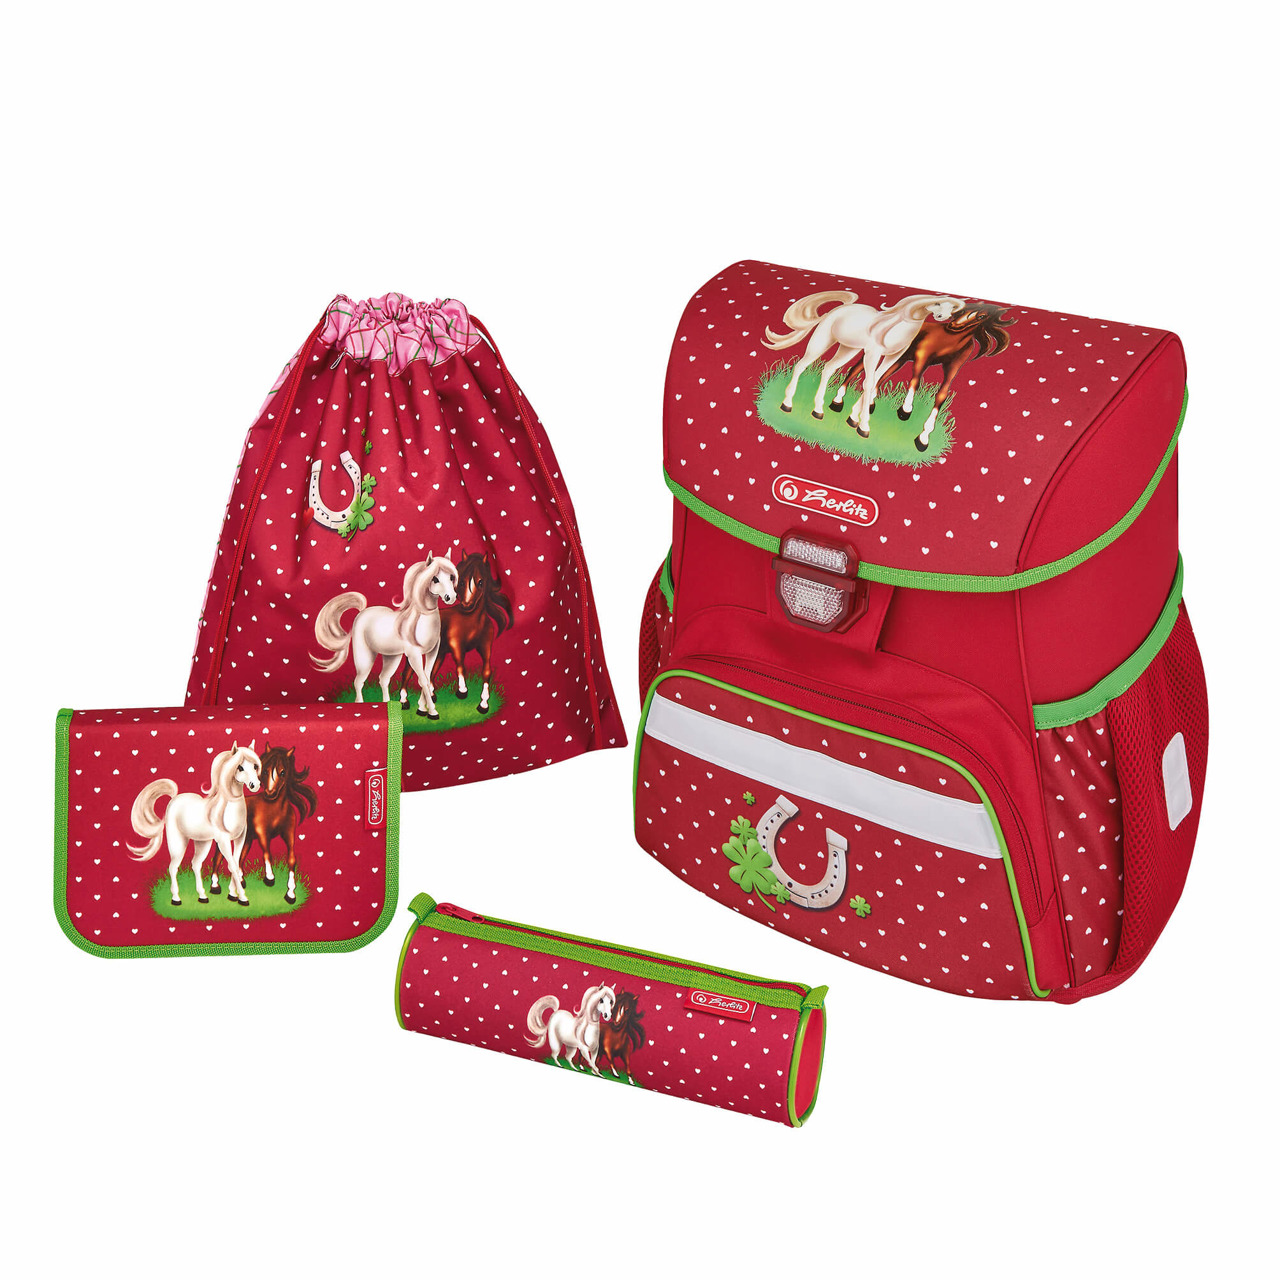 982c8c2b98fcf ... Zestaw tornister plecak Loop Plus Horses HERLITZ Kliknij, aby  powiększyć ...